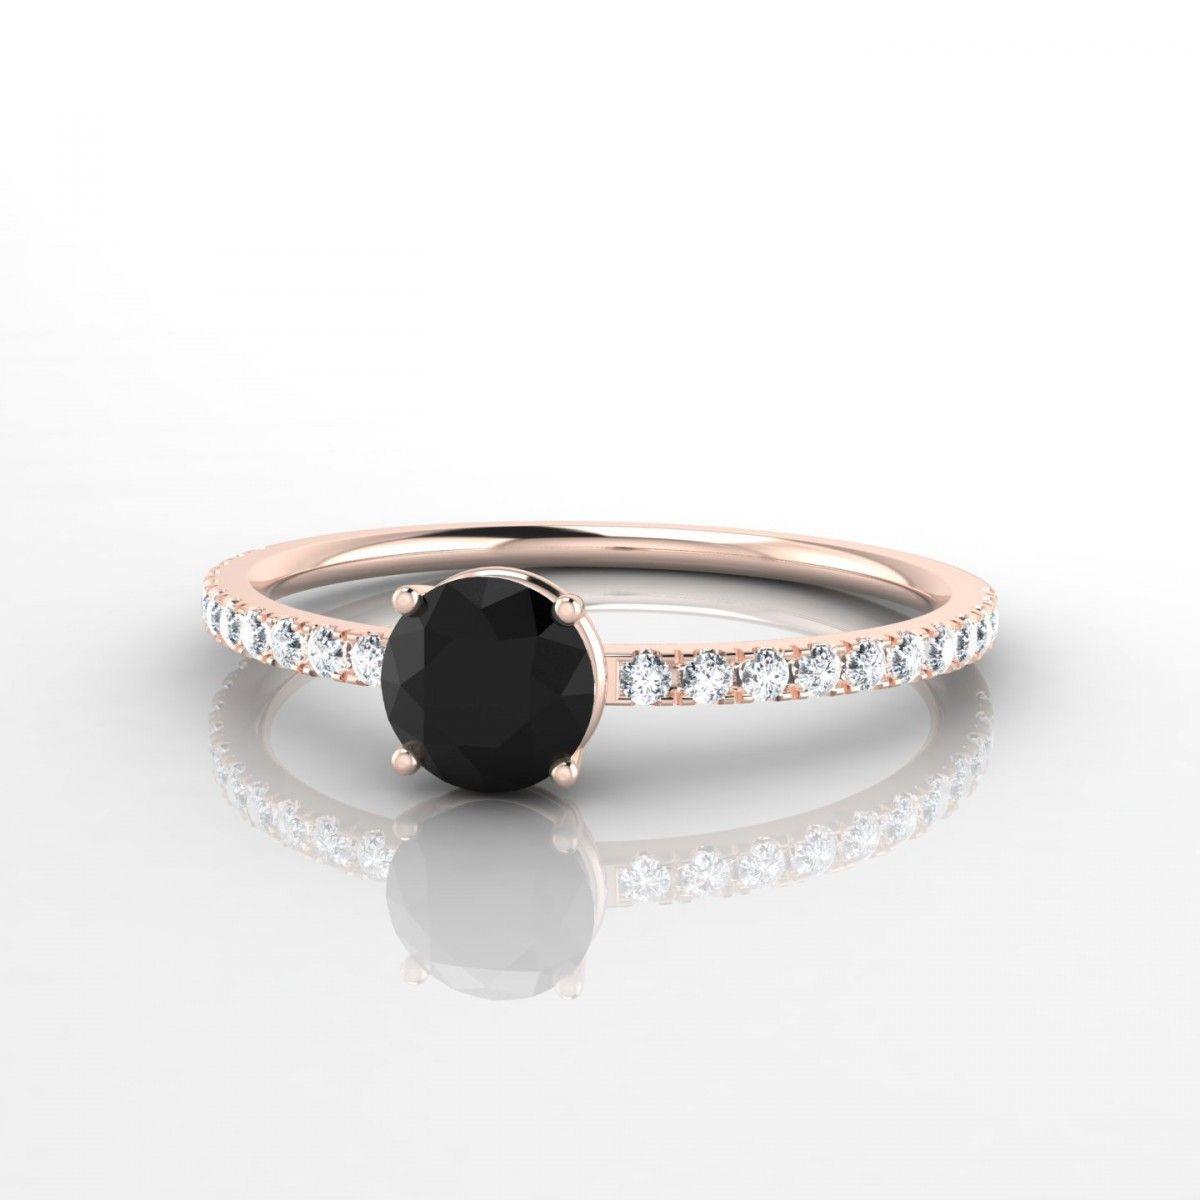 a8223578af1 ❤️Aliénor Bague Diamant noir en Or rose 18k❤️